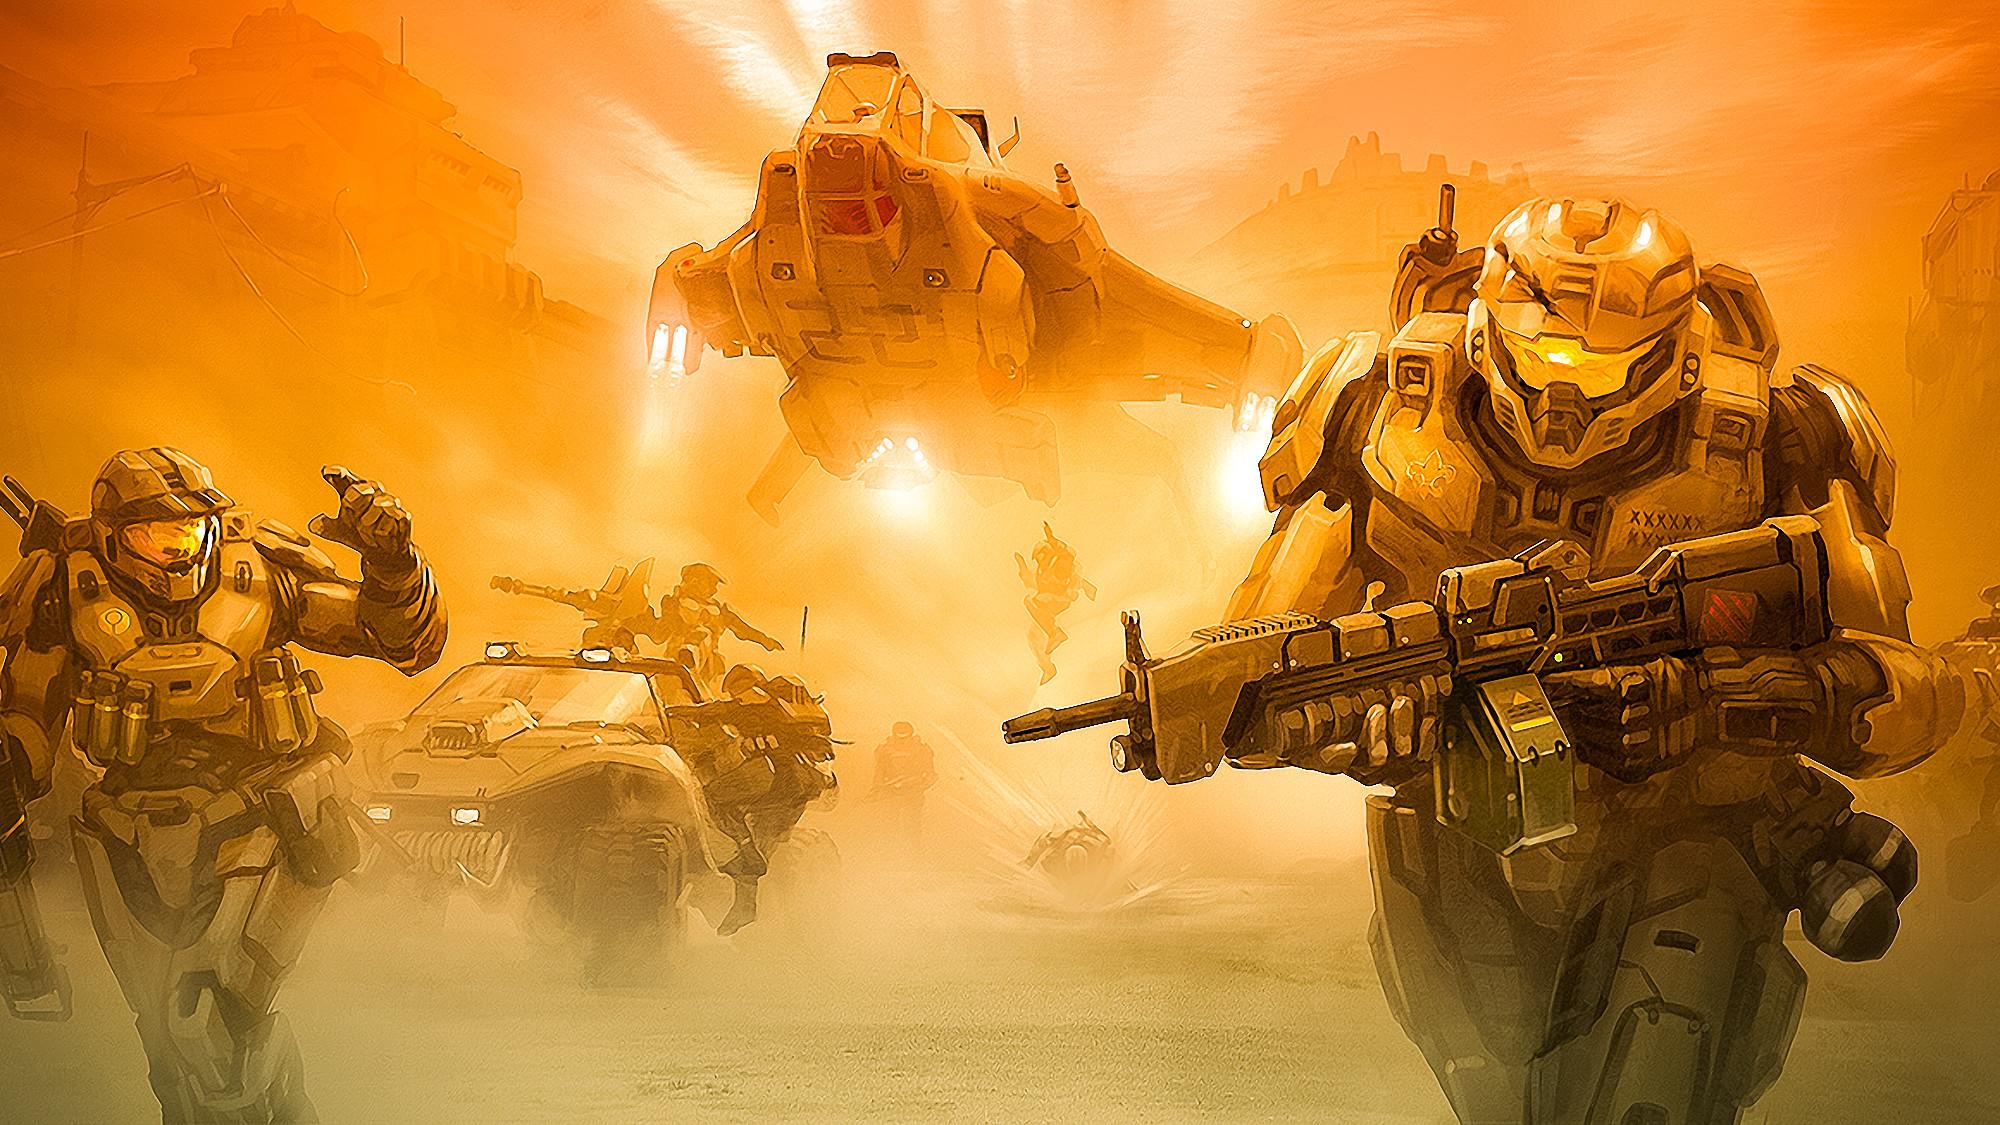 Halo Spartan Wallpaper (73+ images)